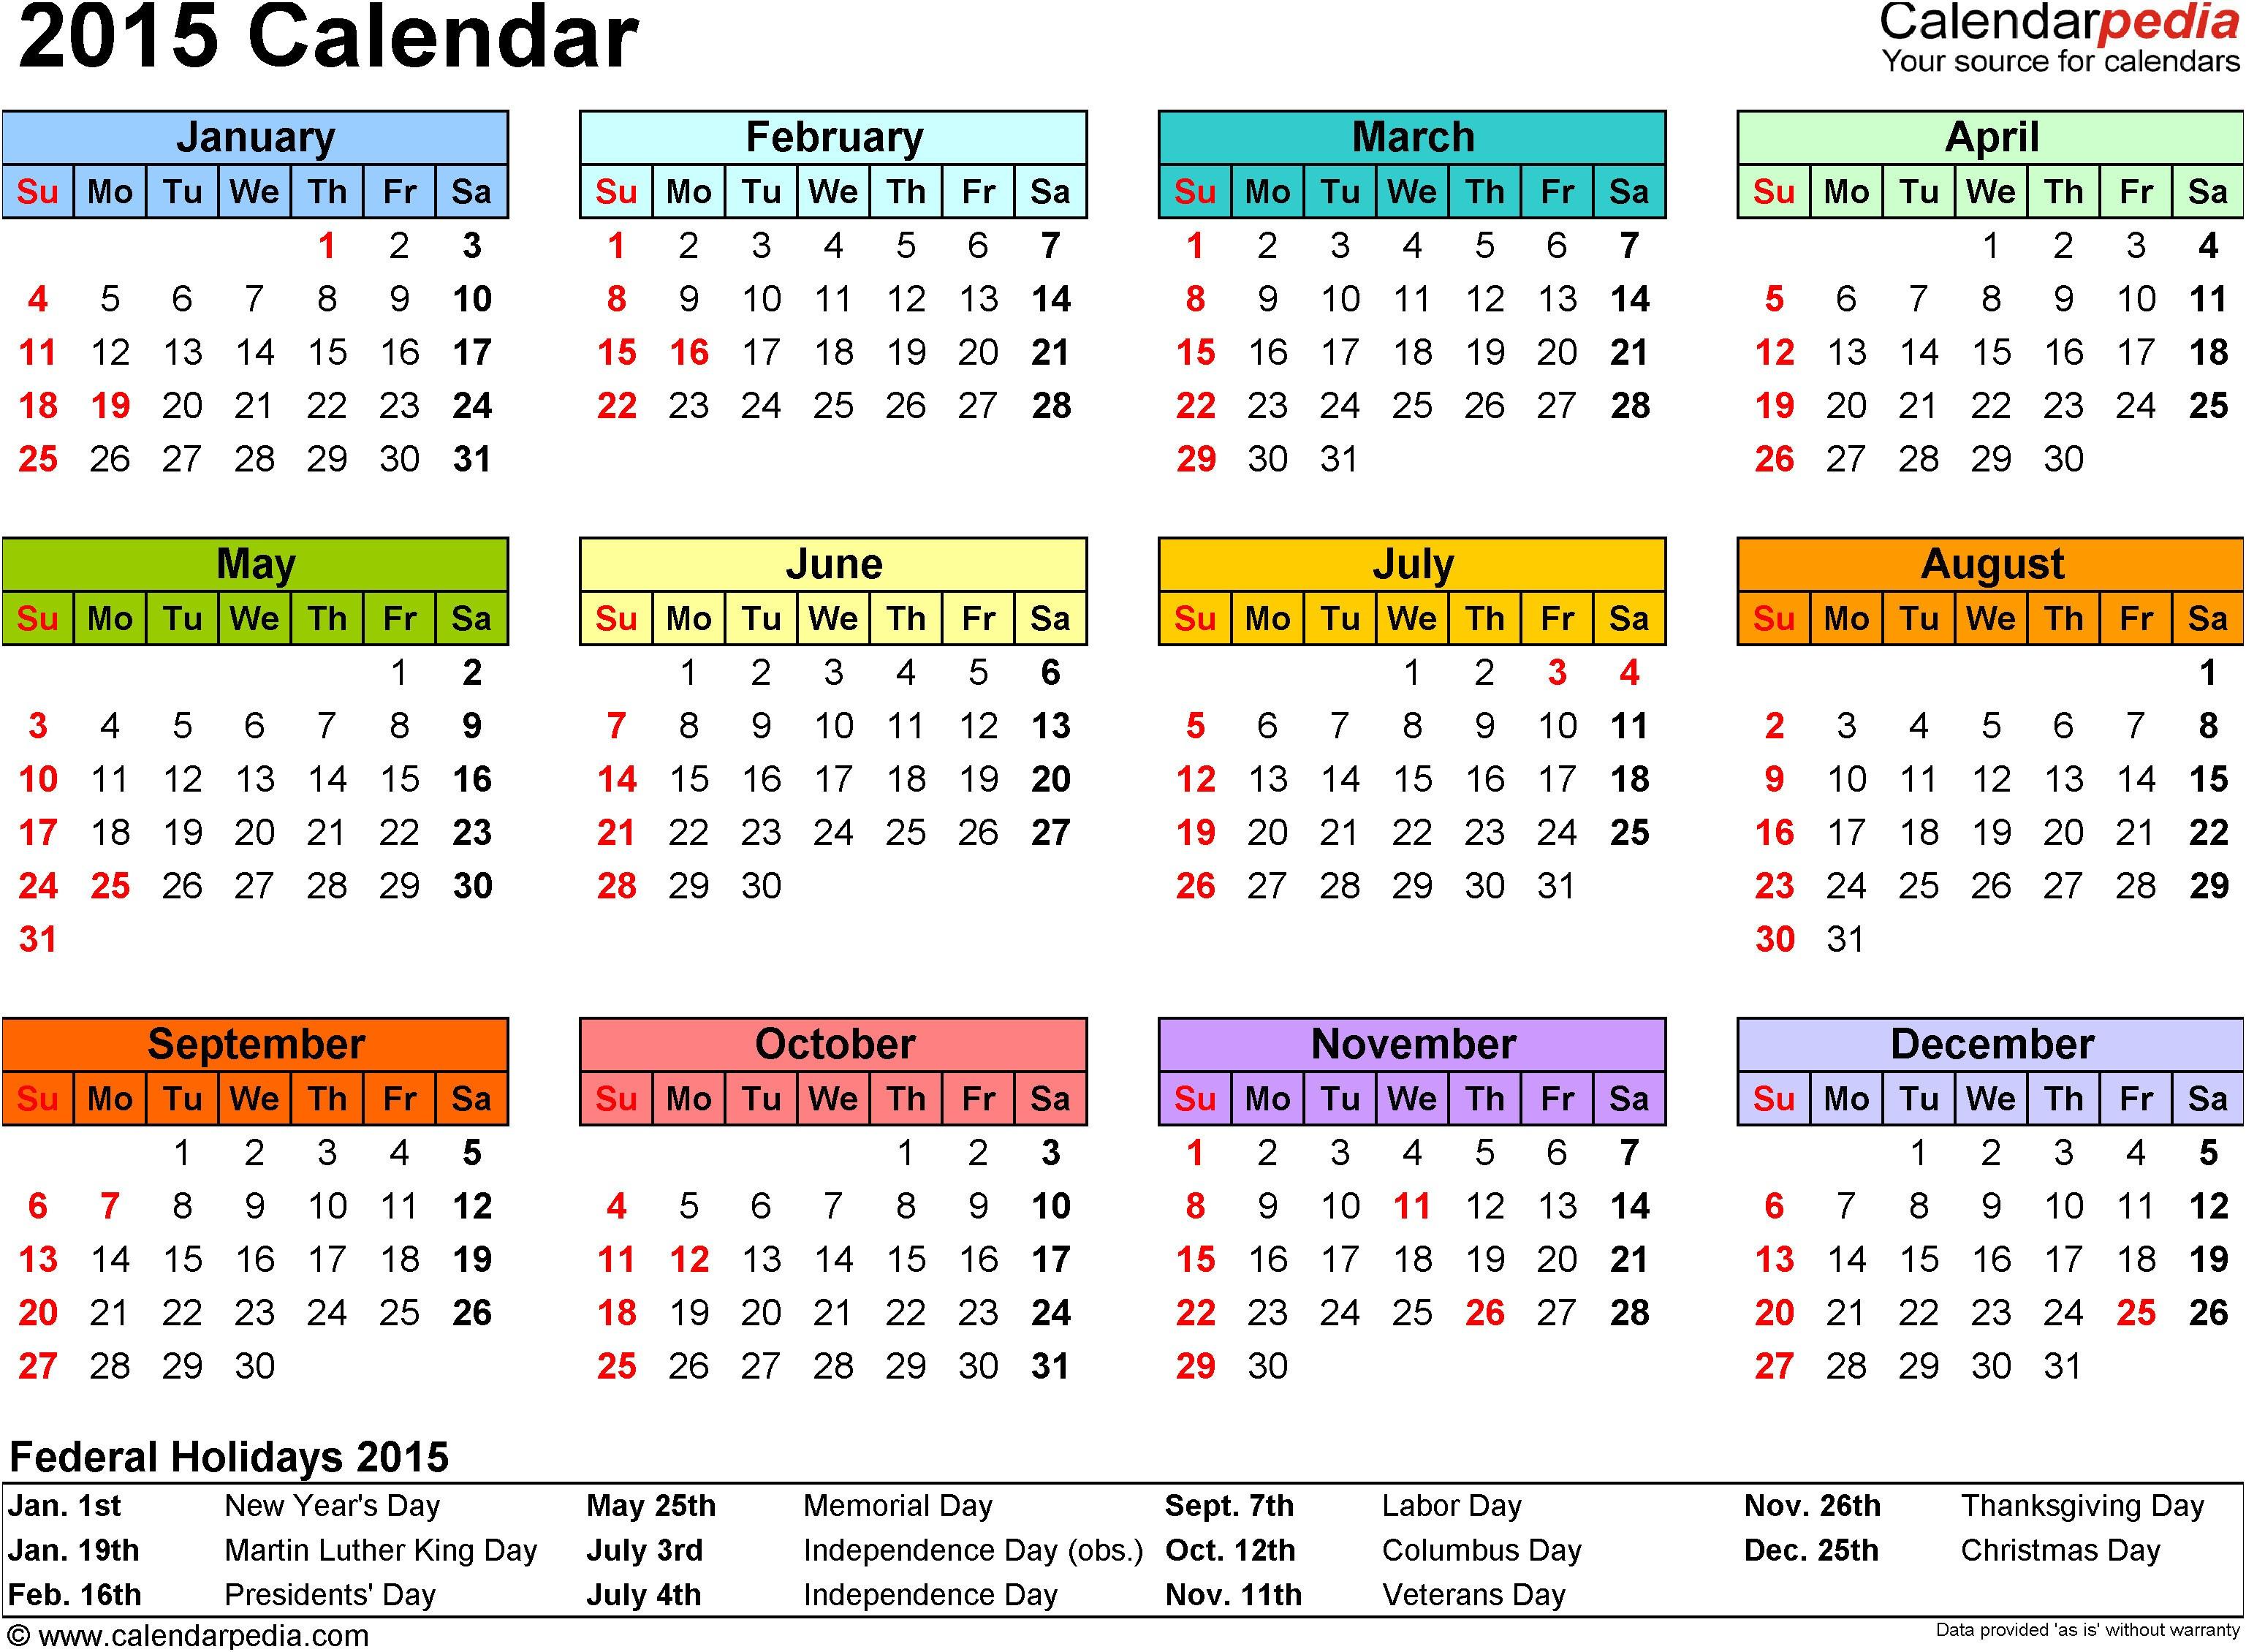 March Calendar Canada Más Populares 2015 Calendar Template with Canadian Holidays 57 Best Printable Of March Calendar Canada Más Arriba-a-fecha Kalender Ausdrucken 2015 Schön Printable 0d Calendars Kalender